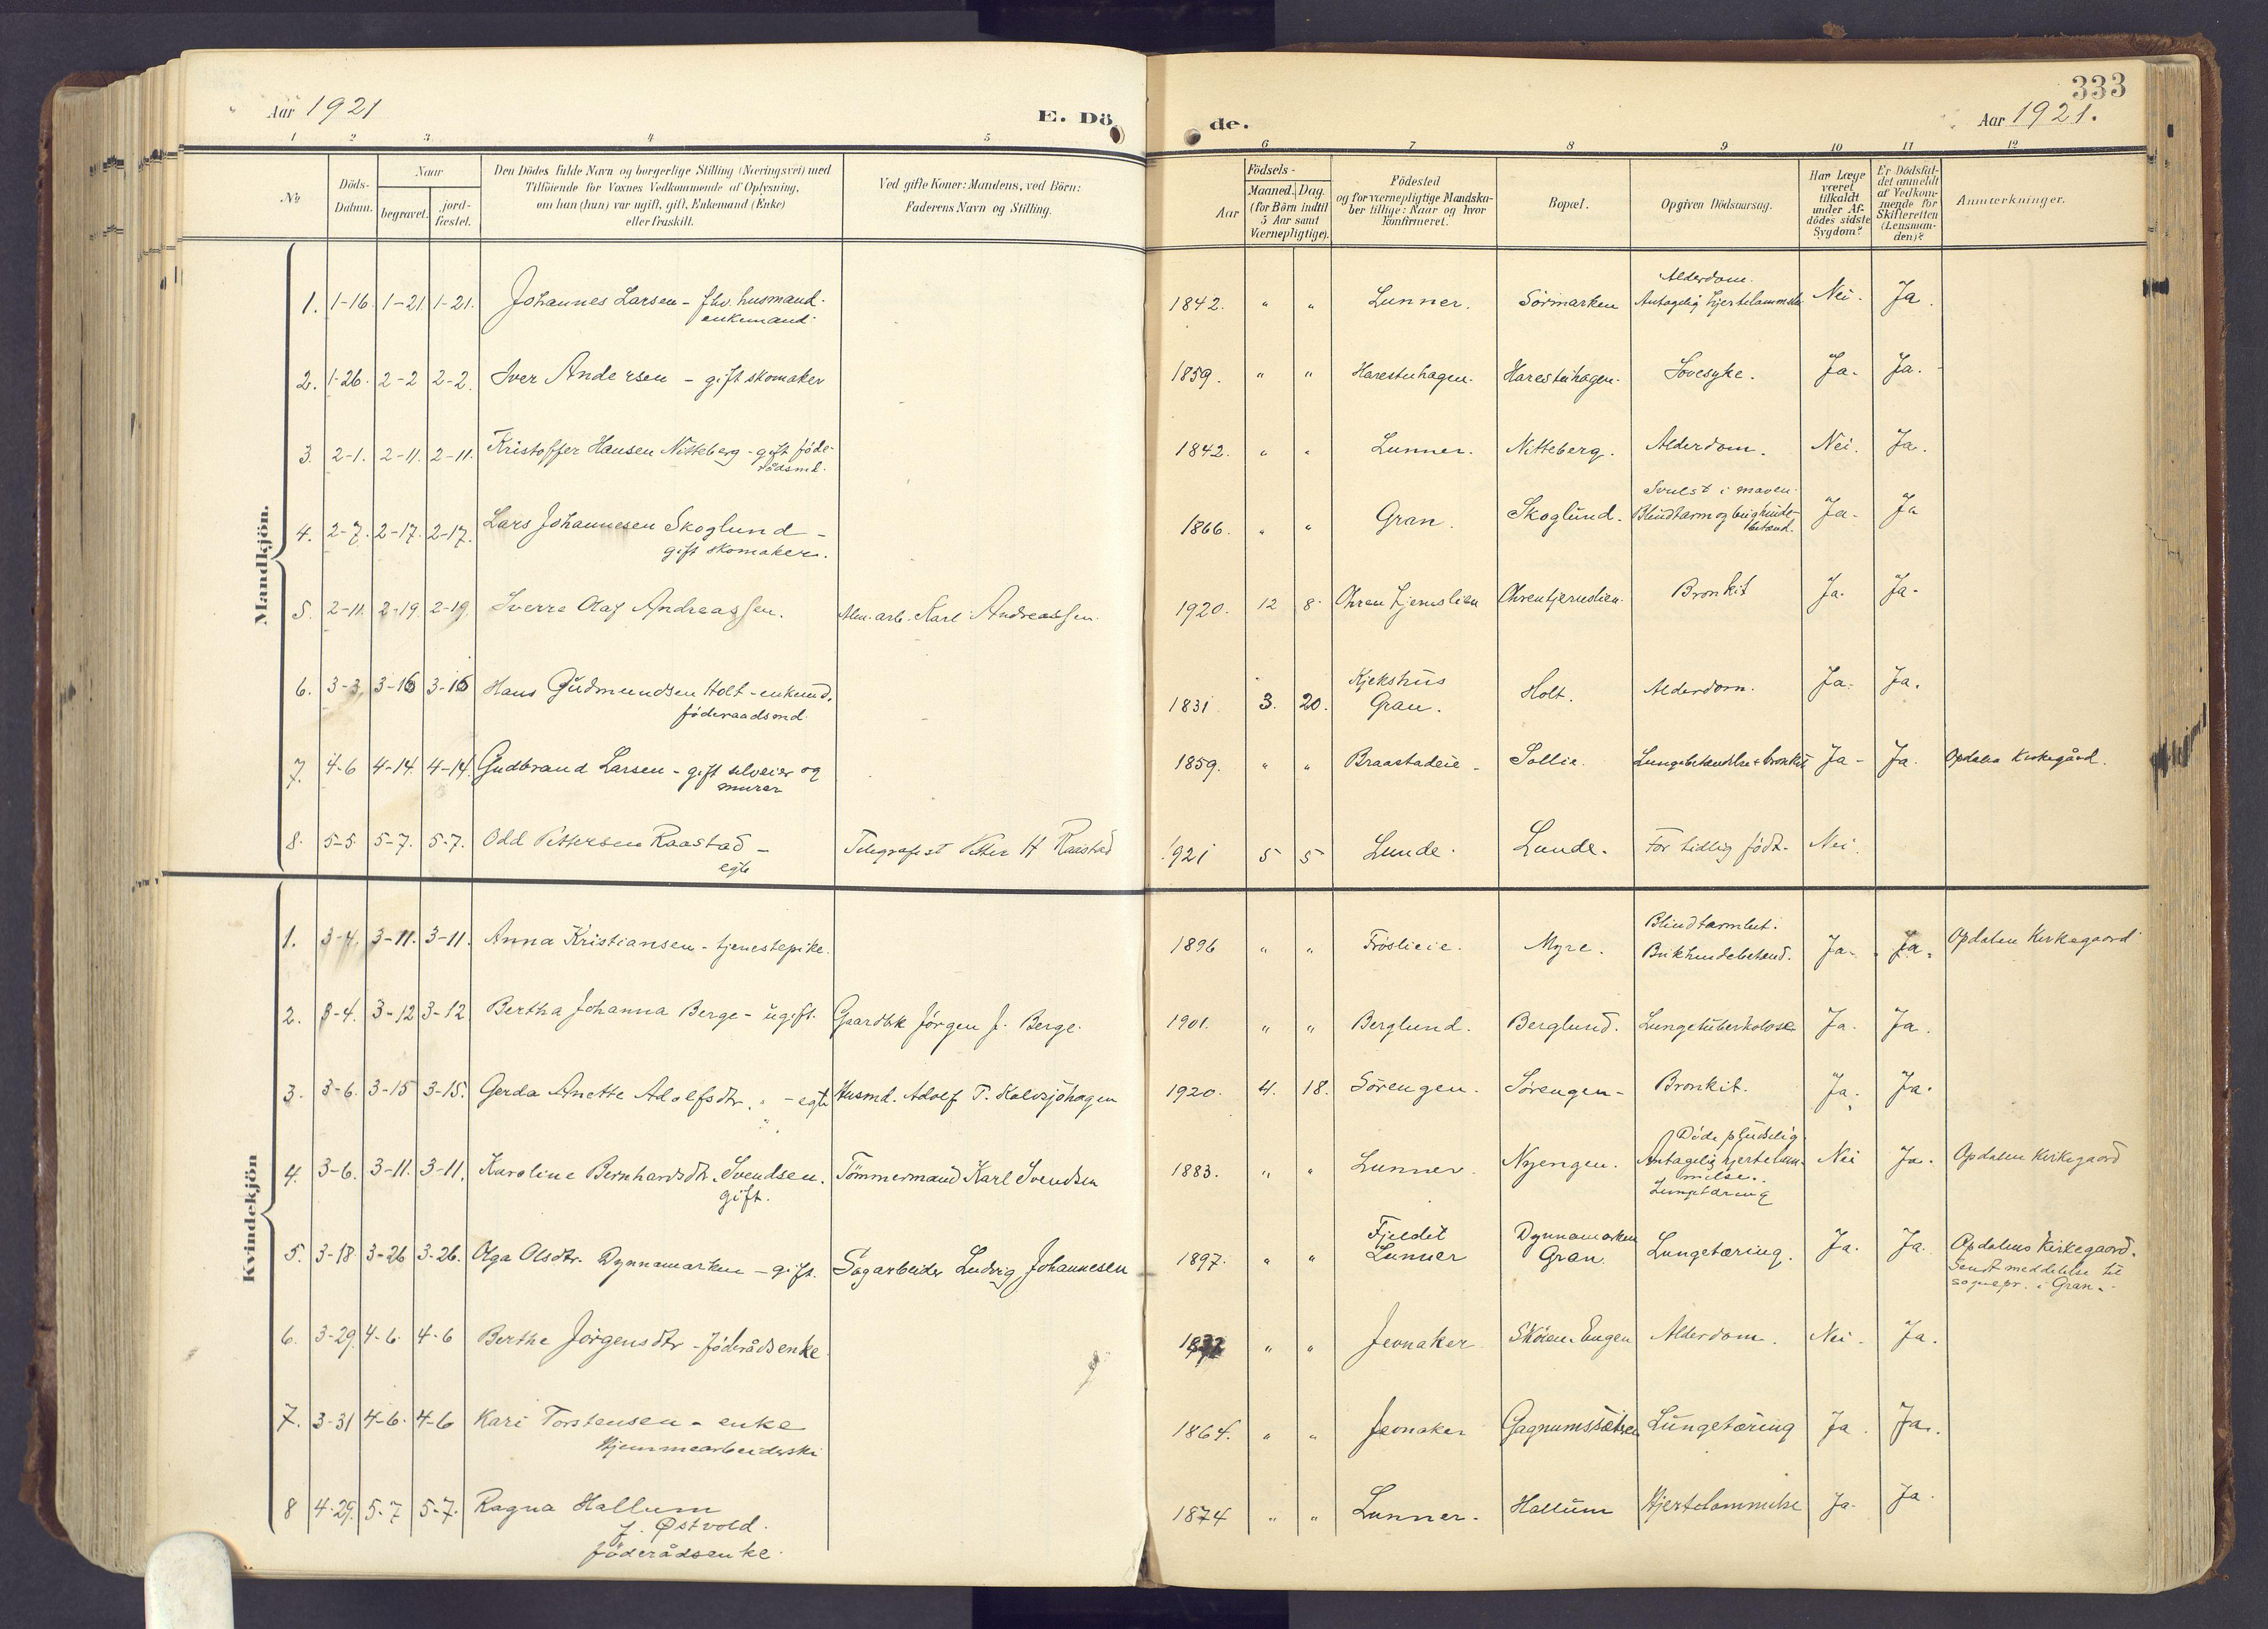 SAH, Lunner prestekontor, H/Ha/Haa/L0001: Ministerialbok nr. 1, 1907-1922, s. 333